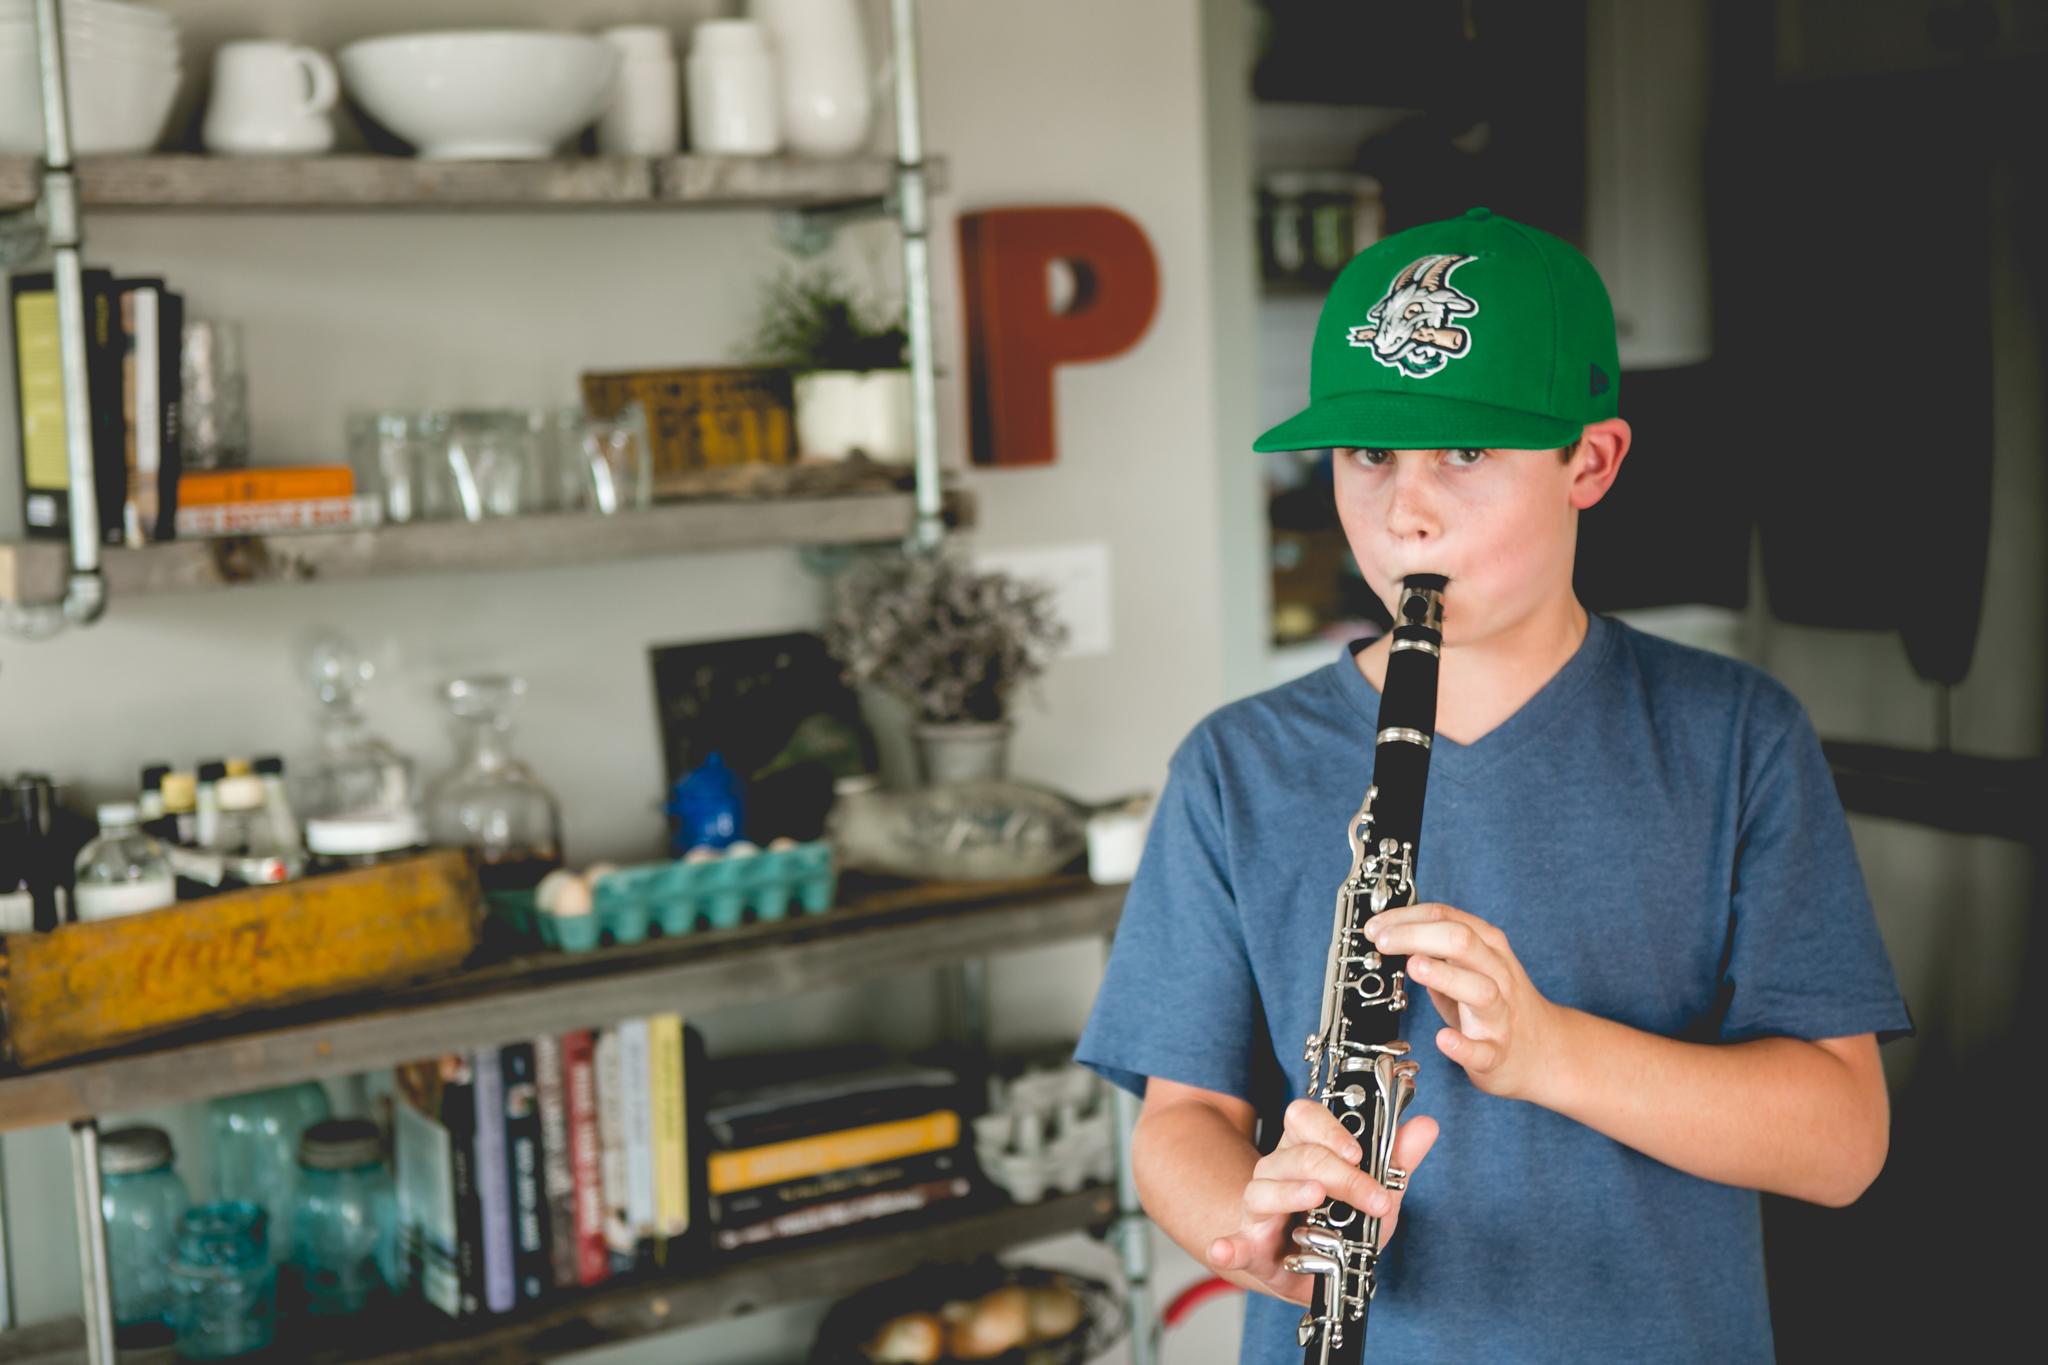 0831 clarinet-005